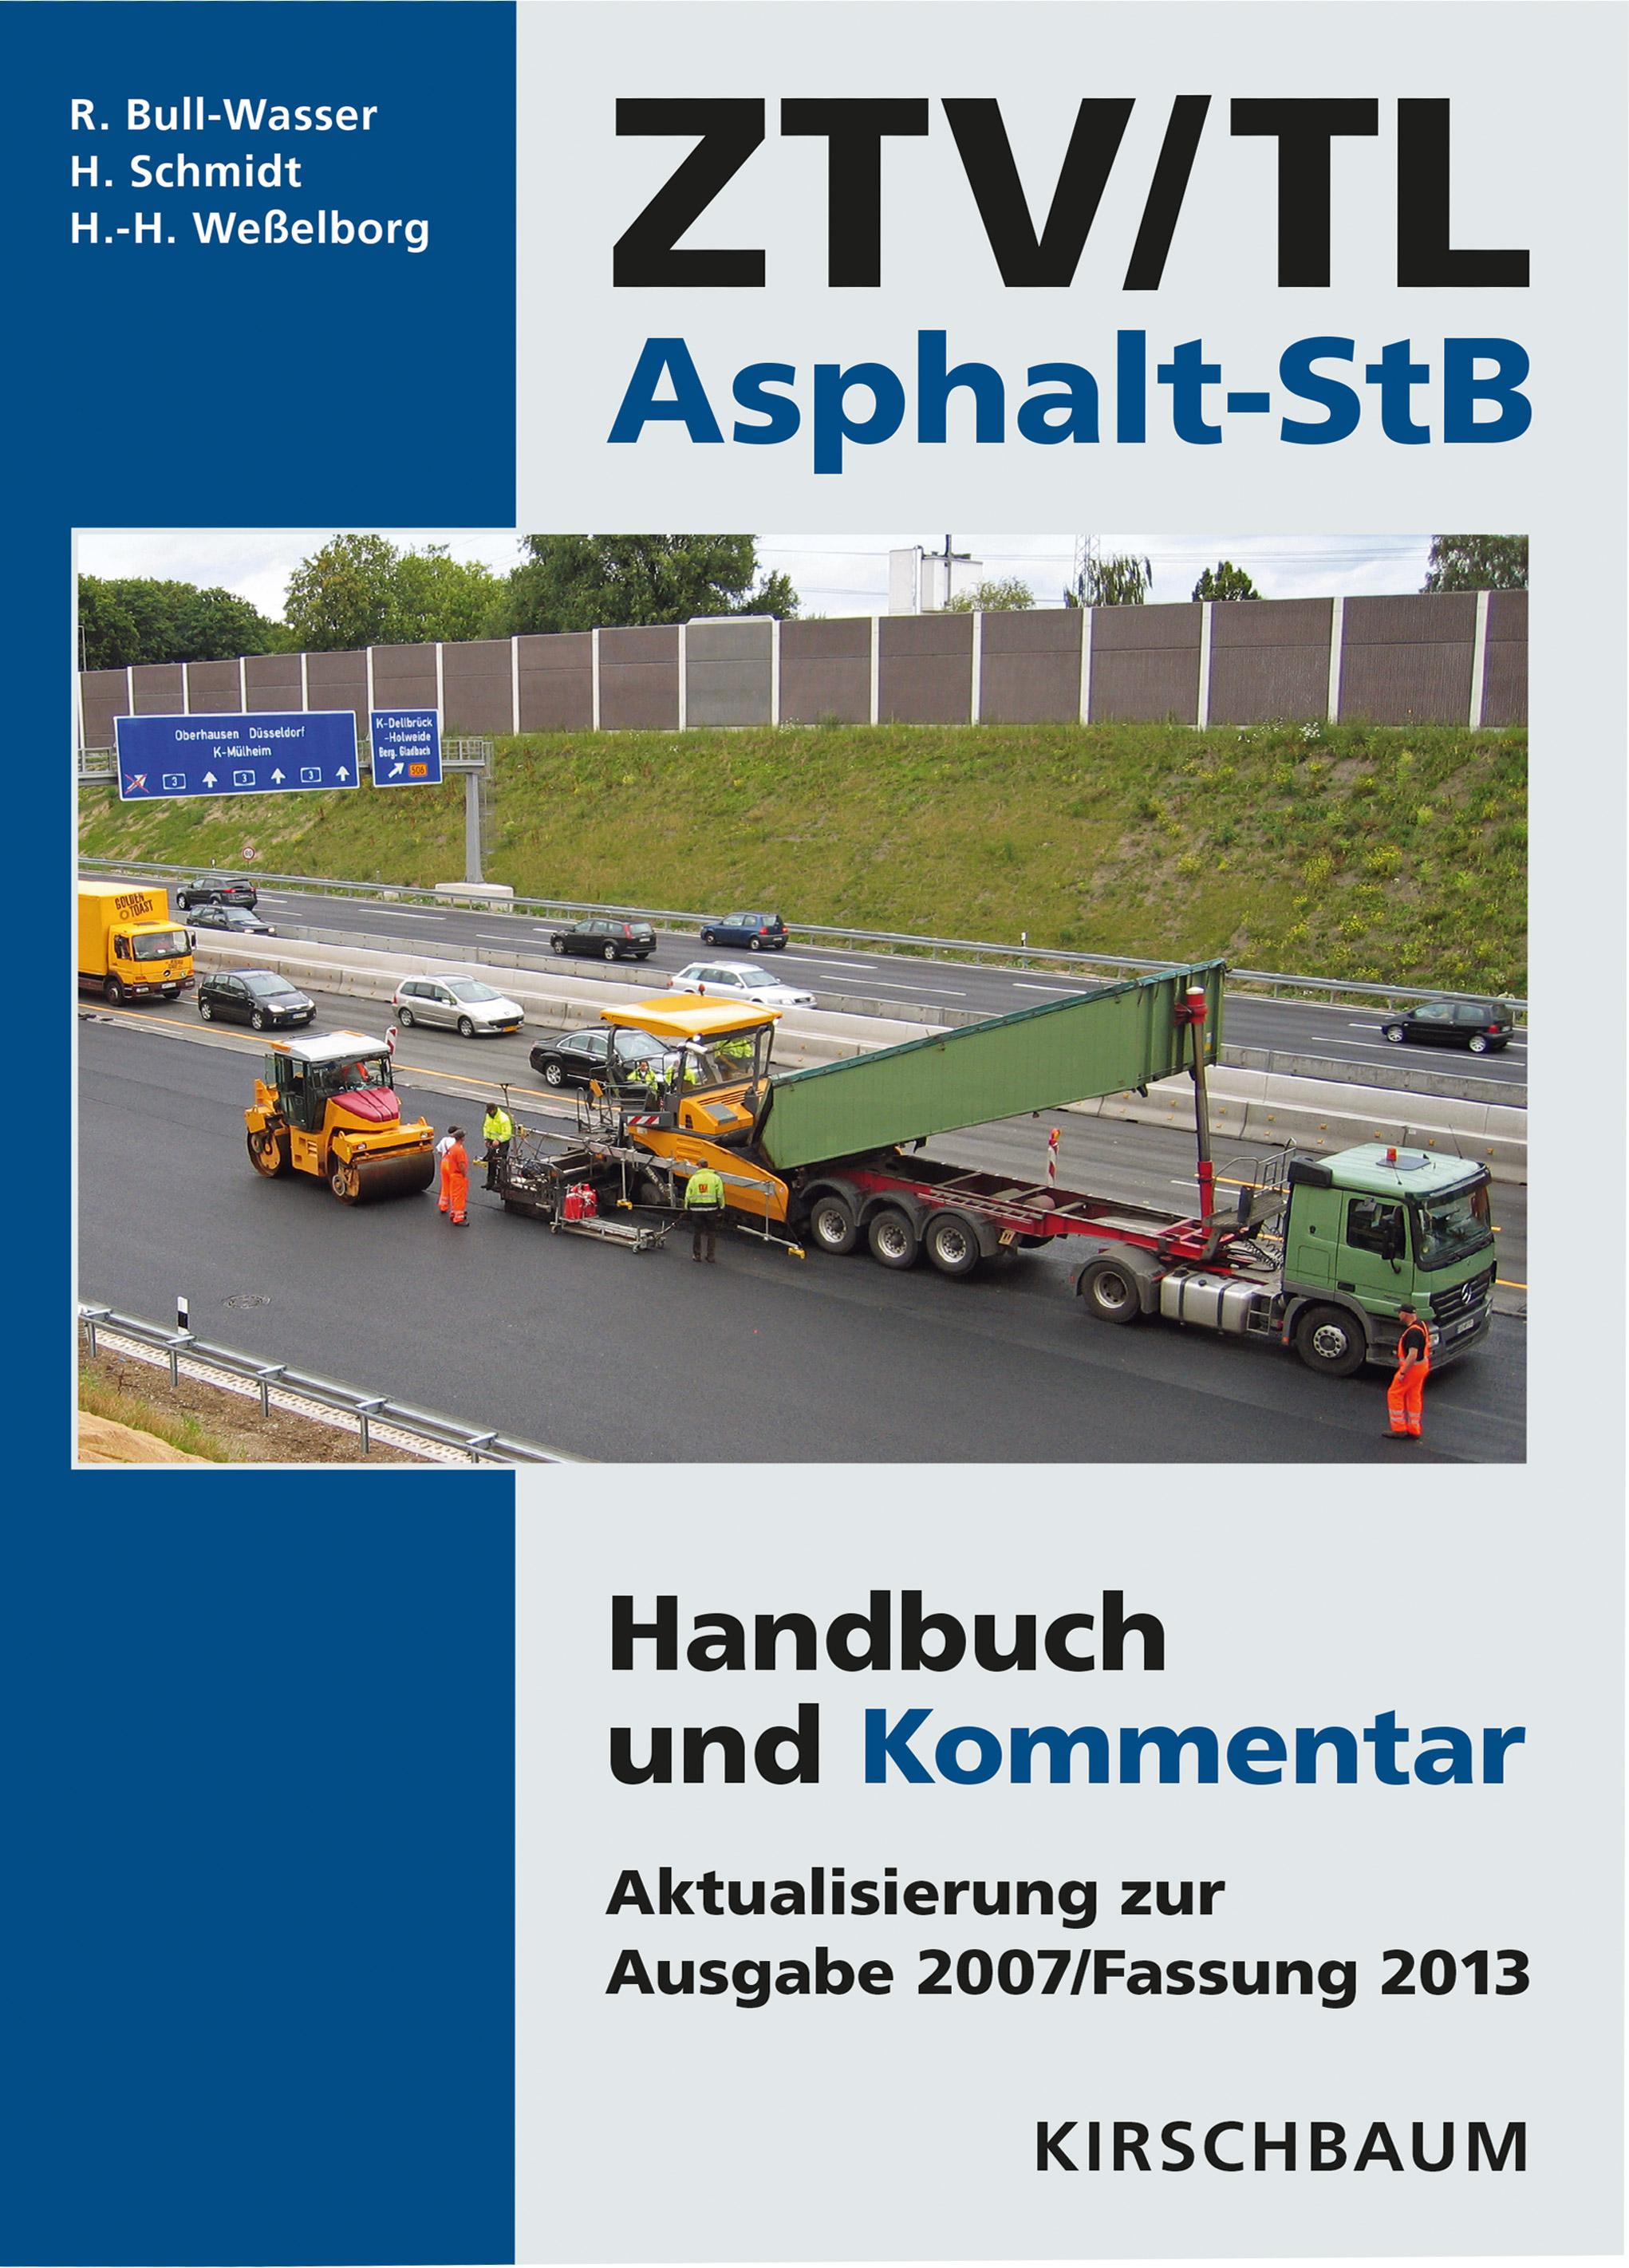 ZTV-TL-Asphalt-StB-Hans-Hermann-Wesselborg-9783781219229